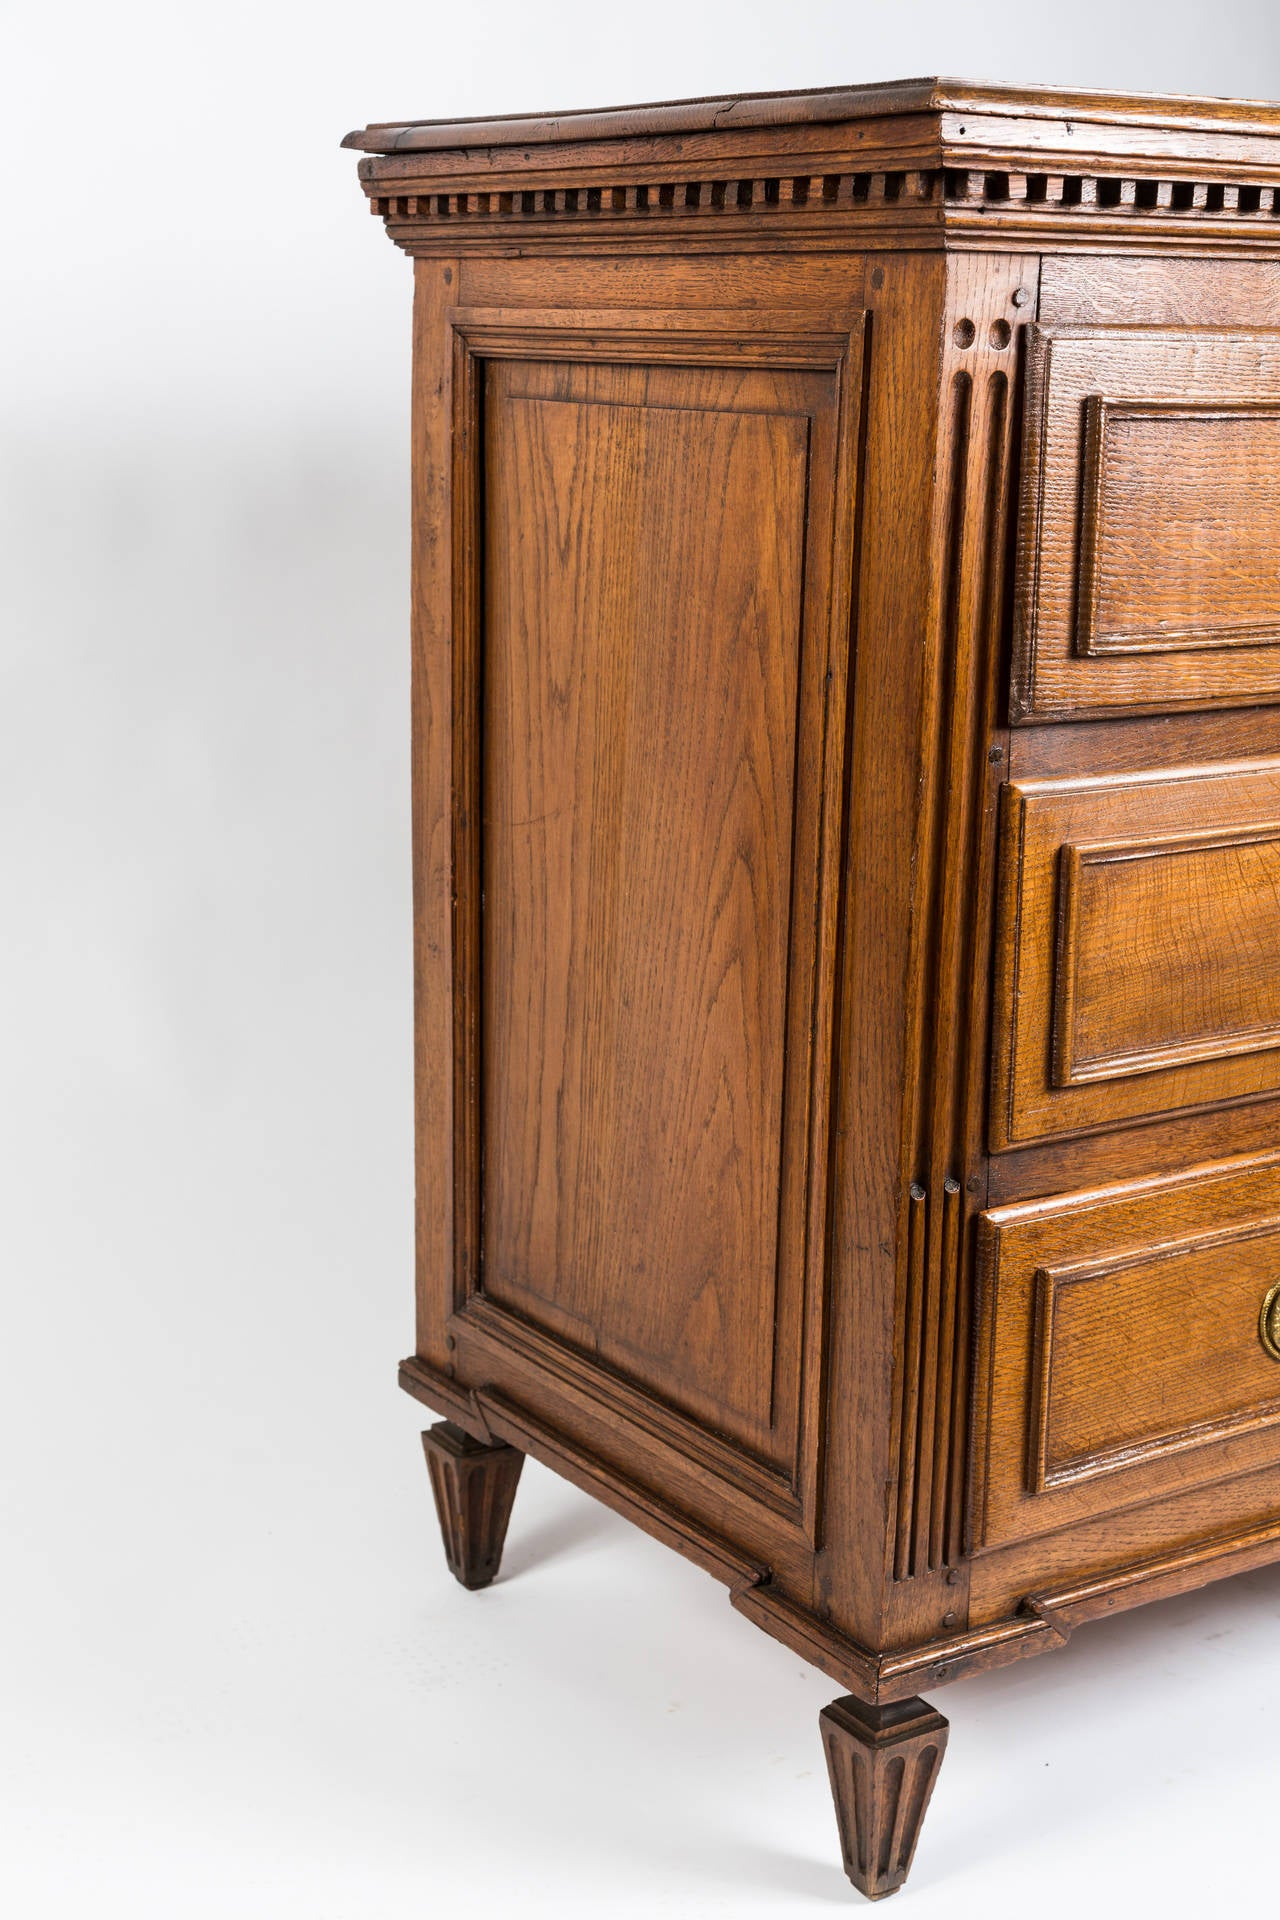 18th Century French Louis XVI Dresser in Solid Oak 2